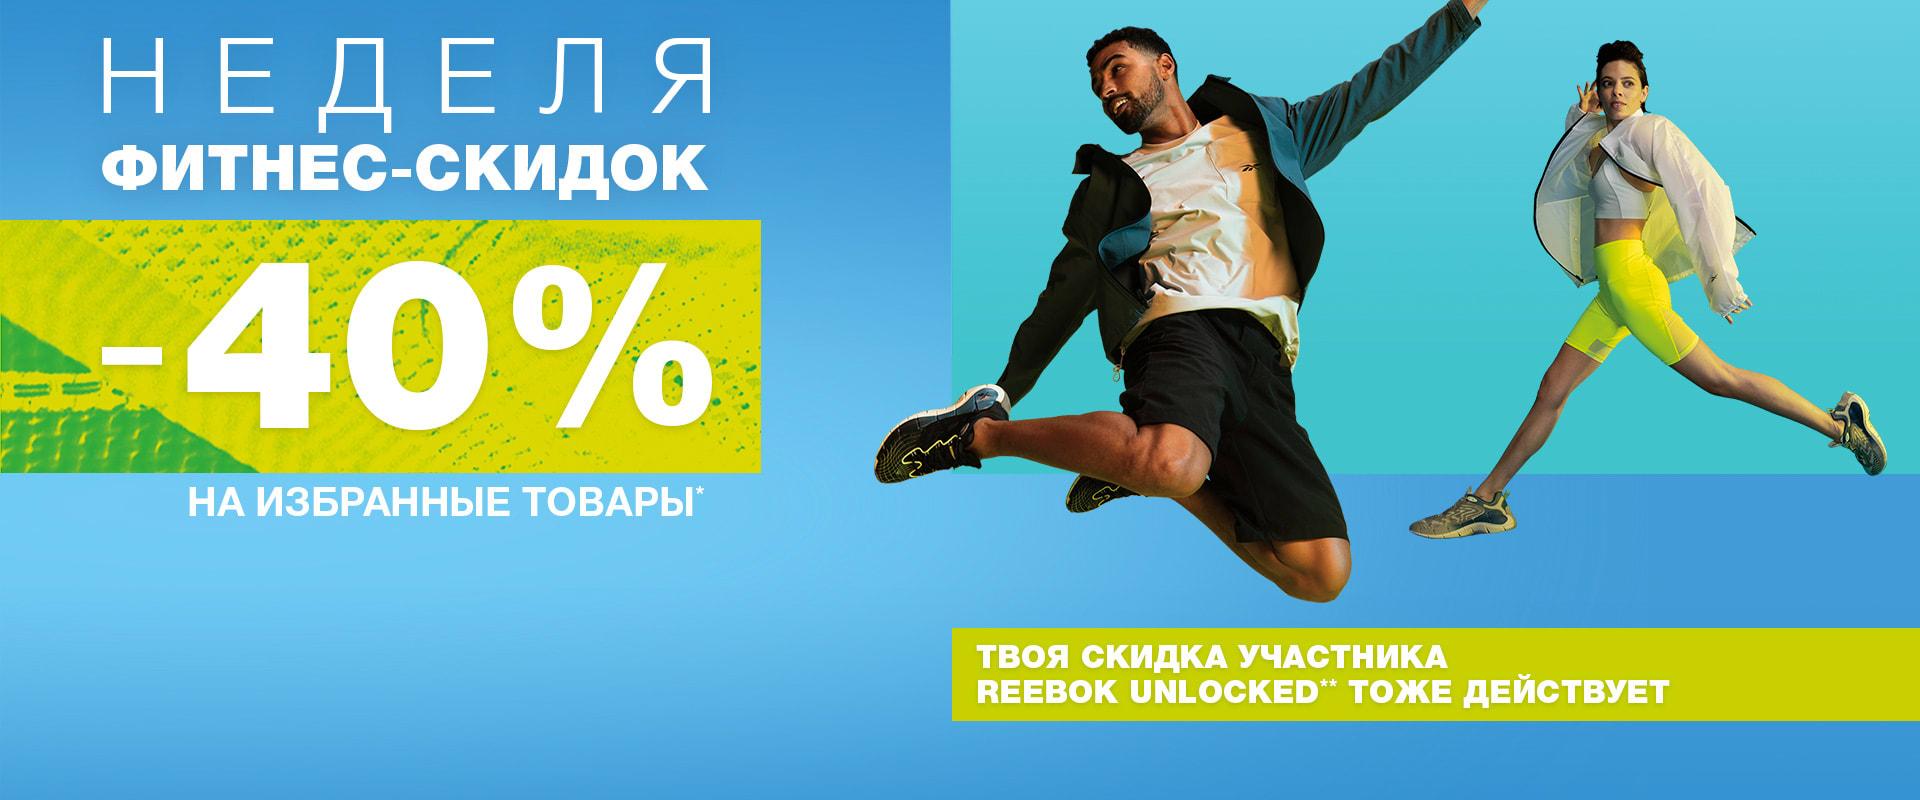 Скидки на Reebok.ru